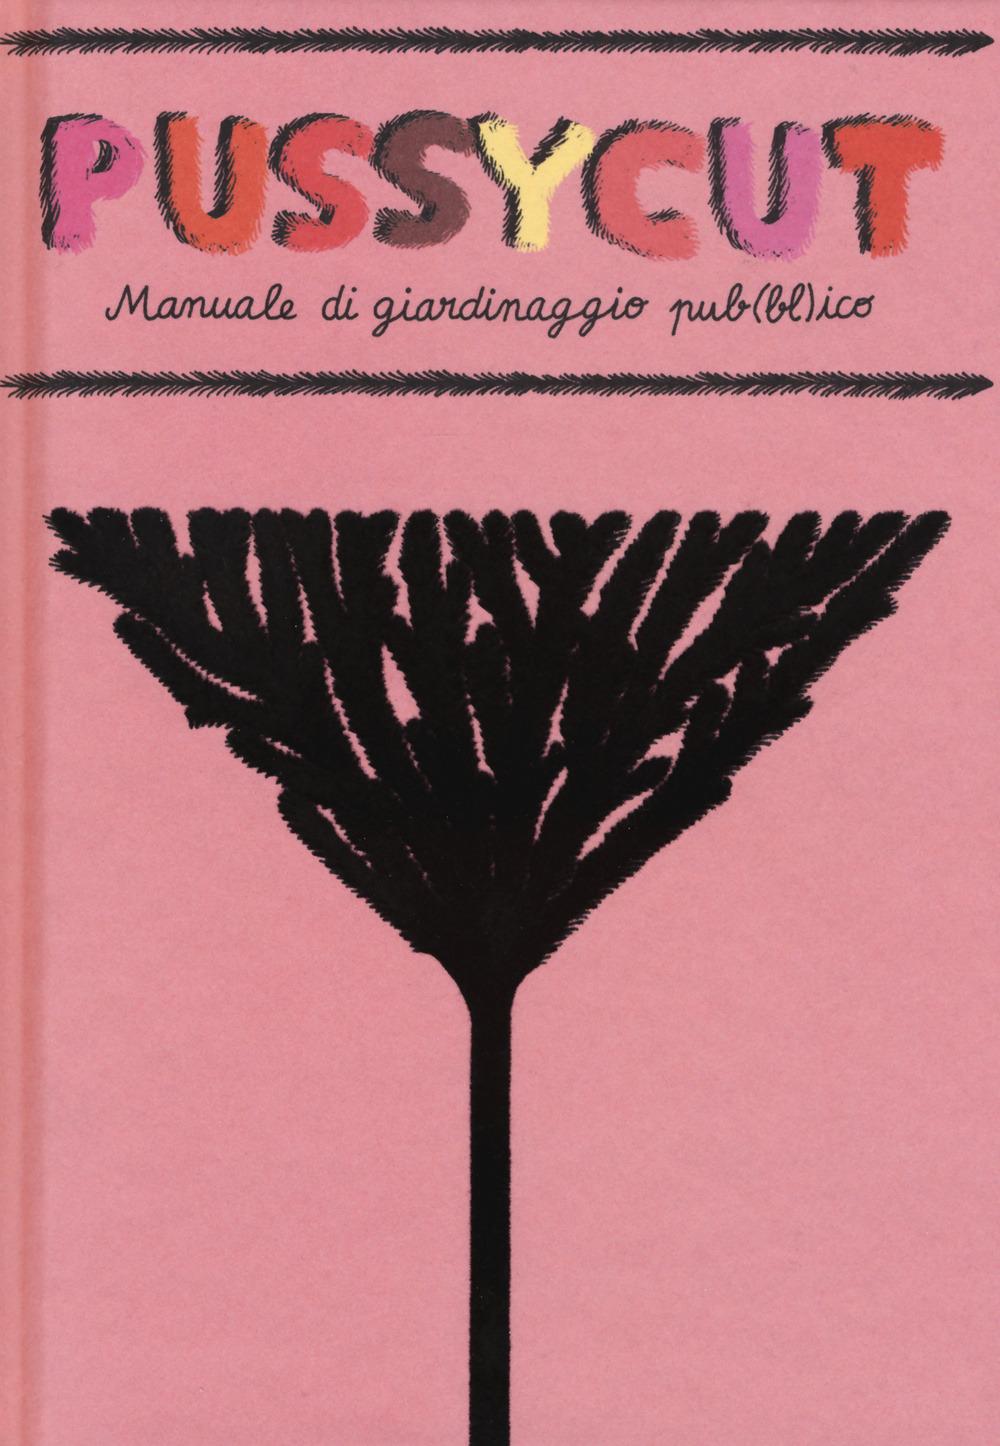 Image of Pussycut. Manuale di giardinaggio pub(bl)ico